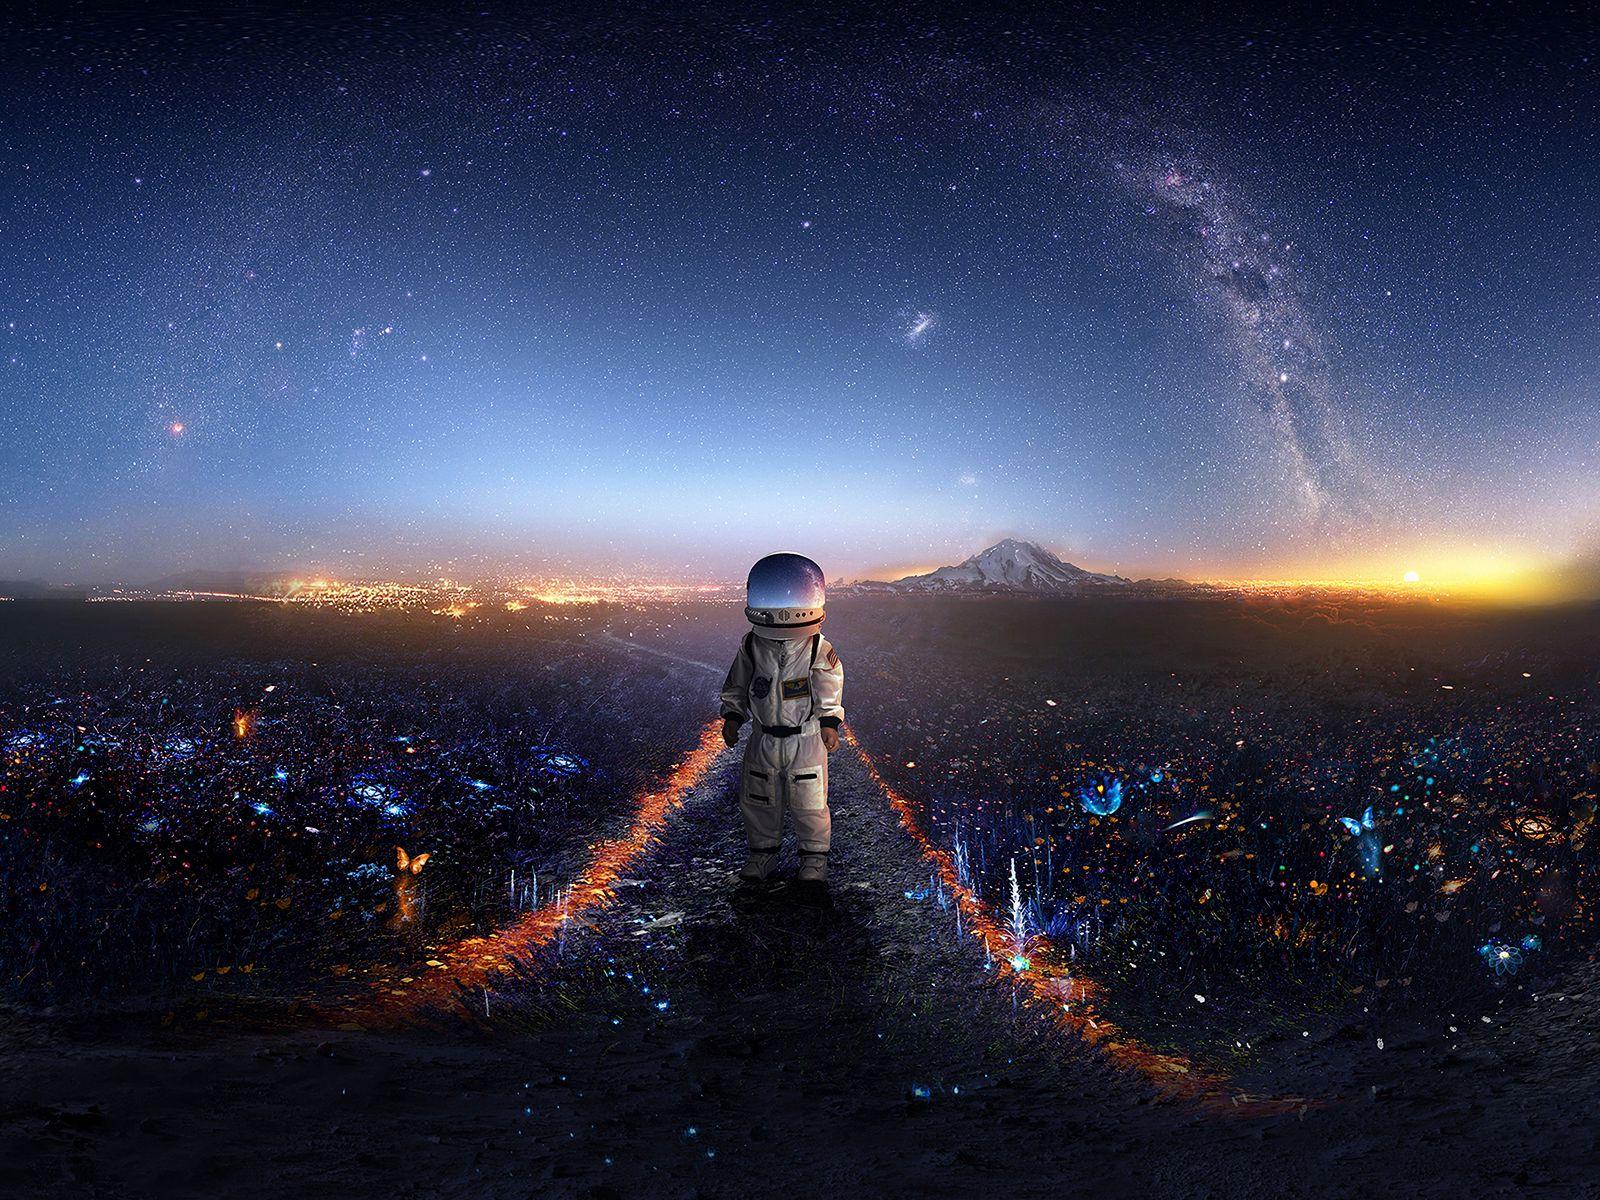 Galaxy Astronaut